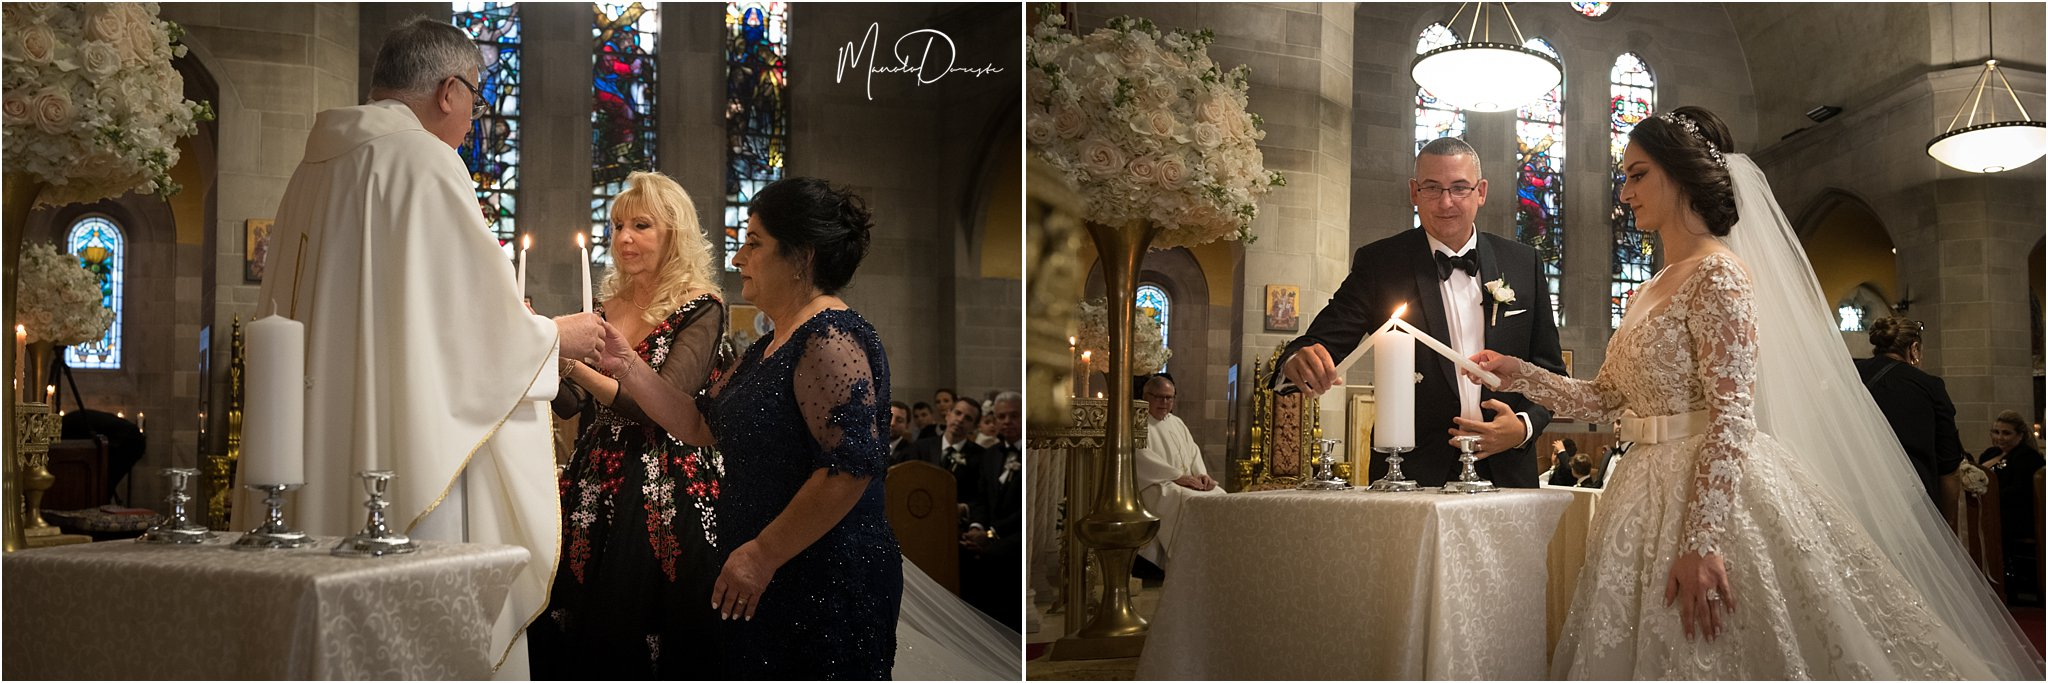 00721_ManoloDoreste_InFocusStudios_Wedding_Family_Photography_Miami_MiamiPhotographer.jpg